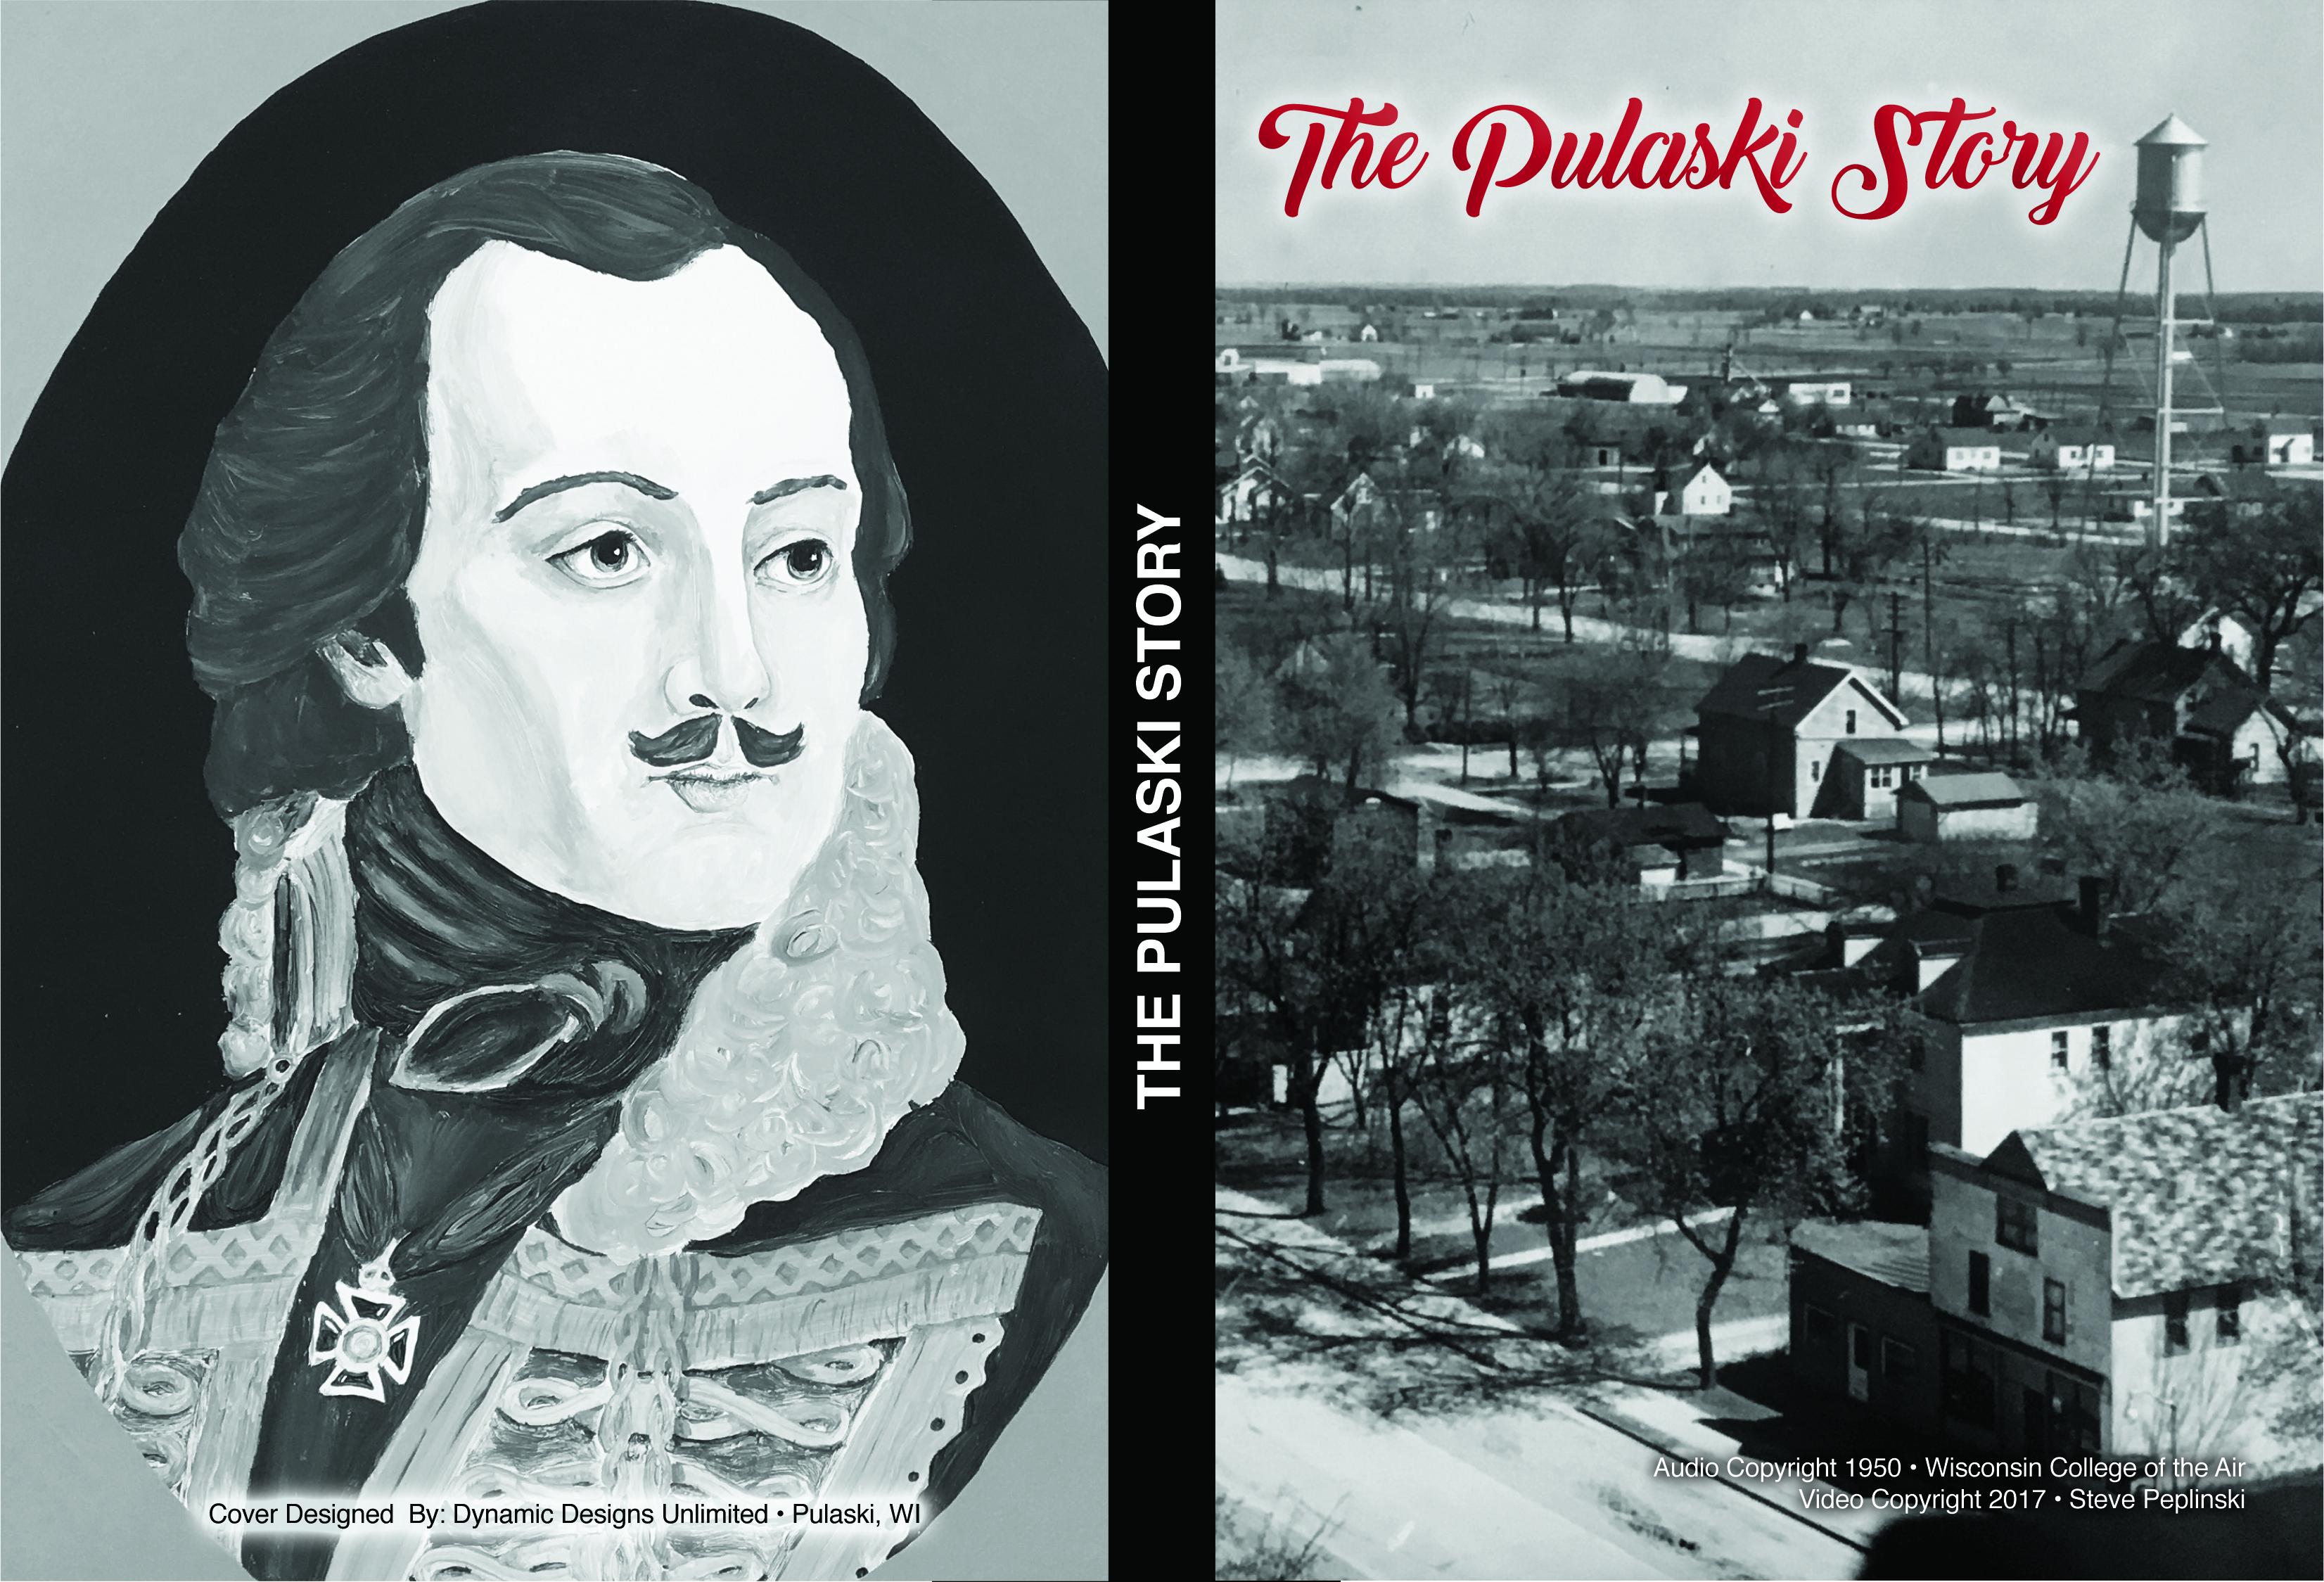 The Pulaski Story